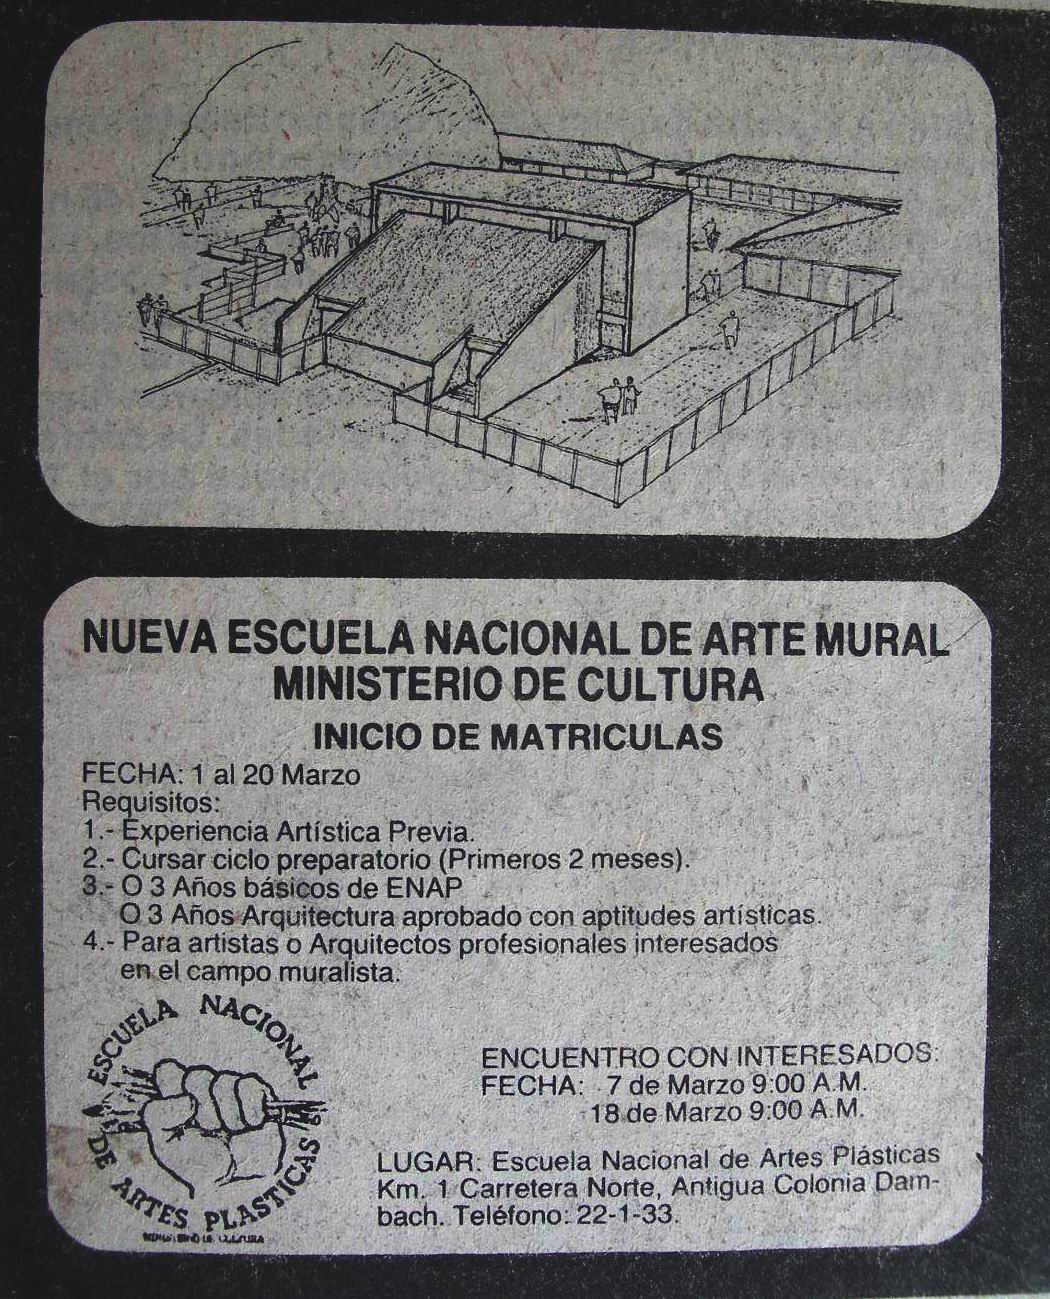 escuela-de-arte-mural-nicaragua.jpg